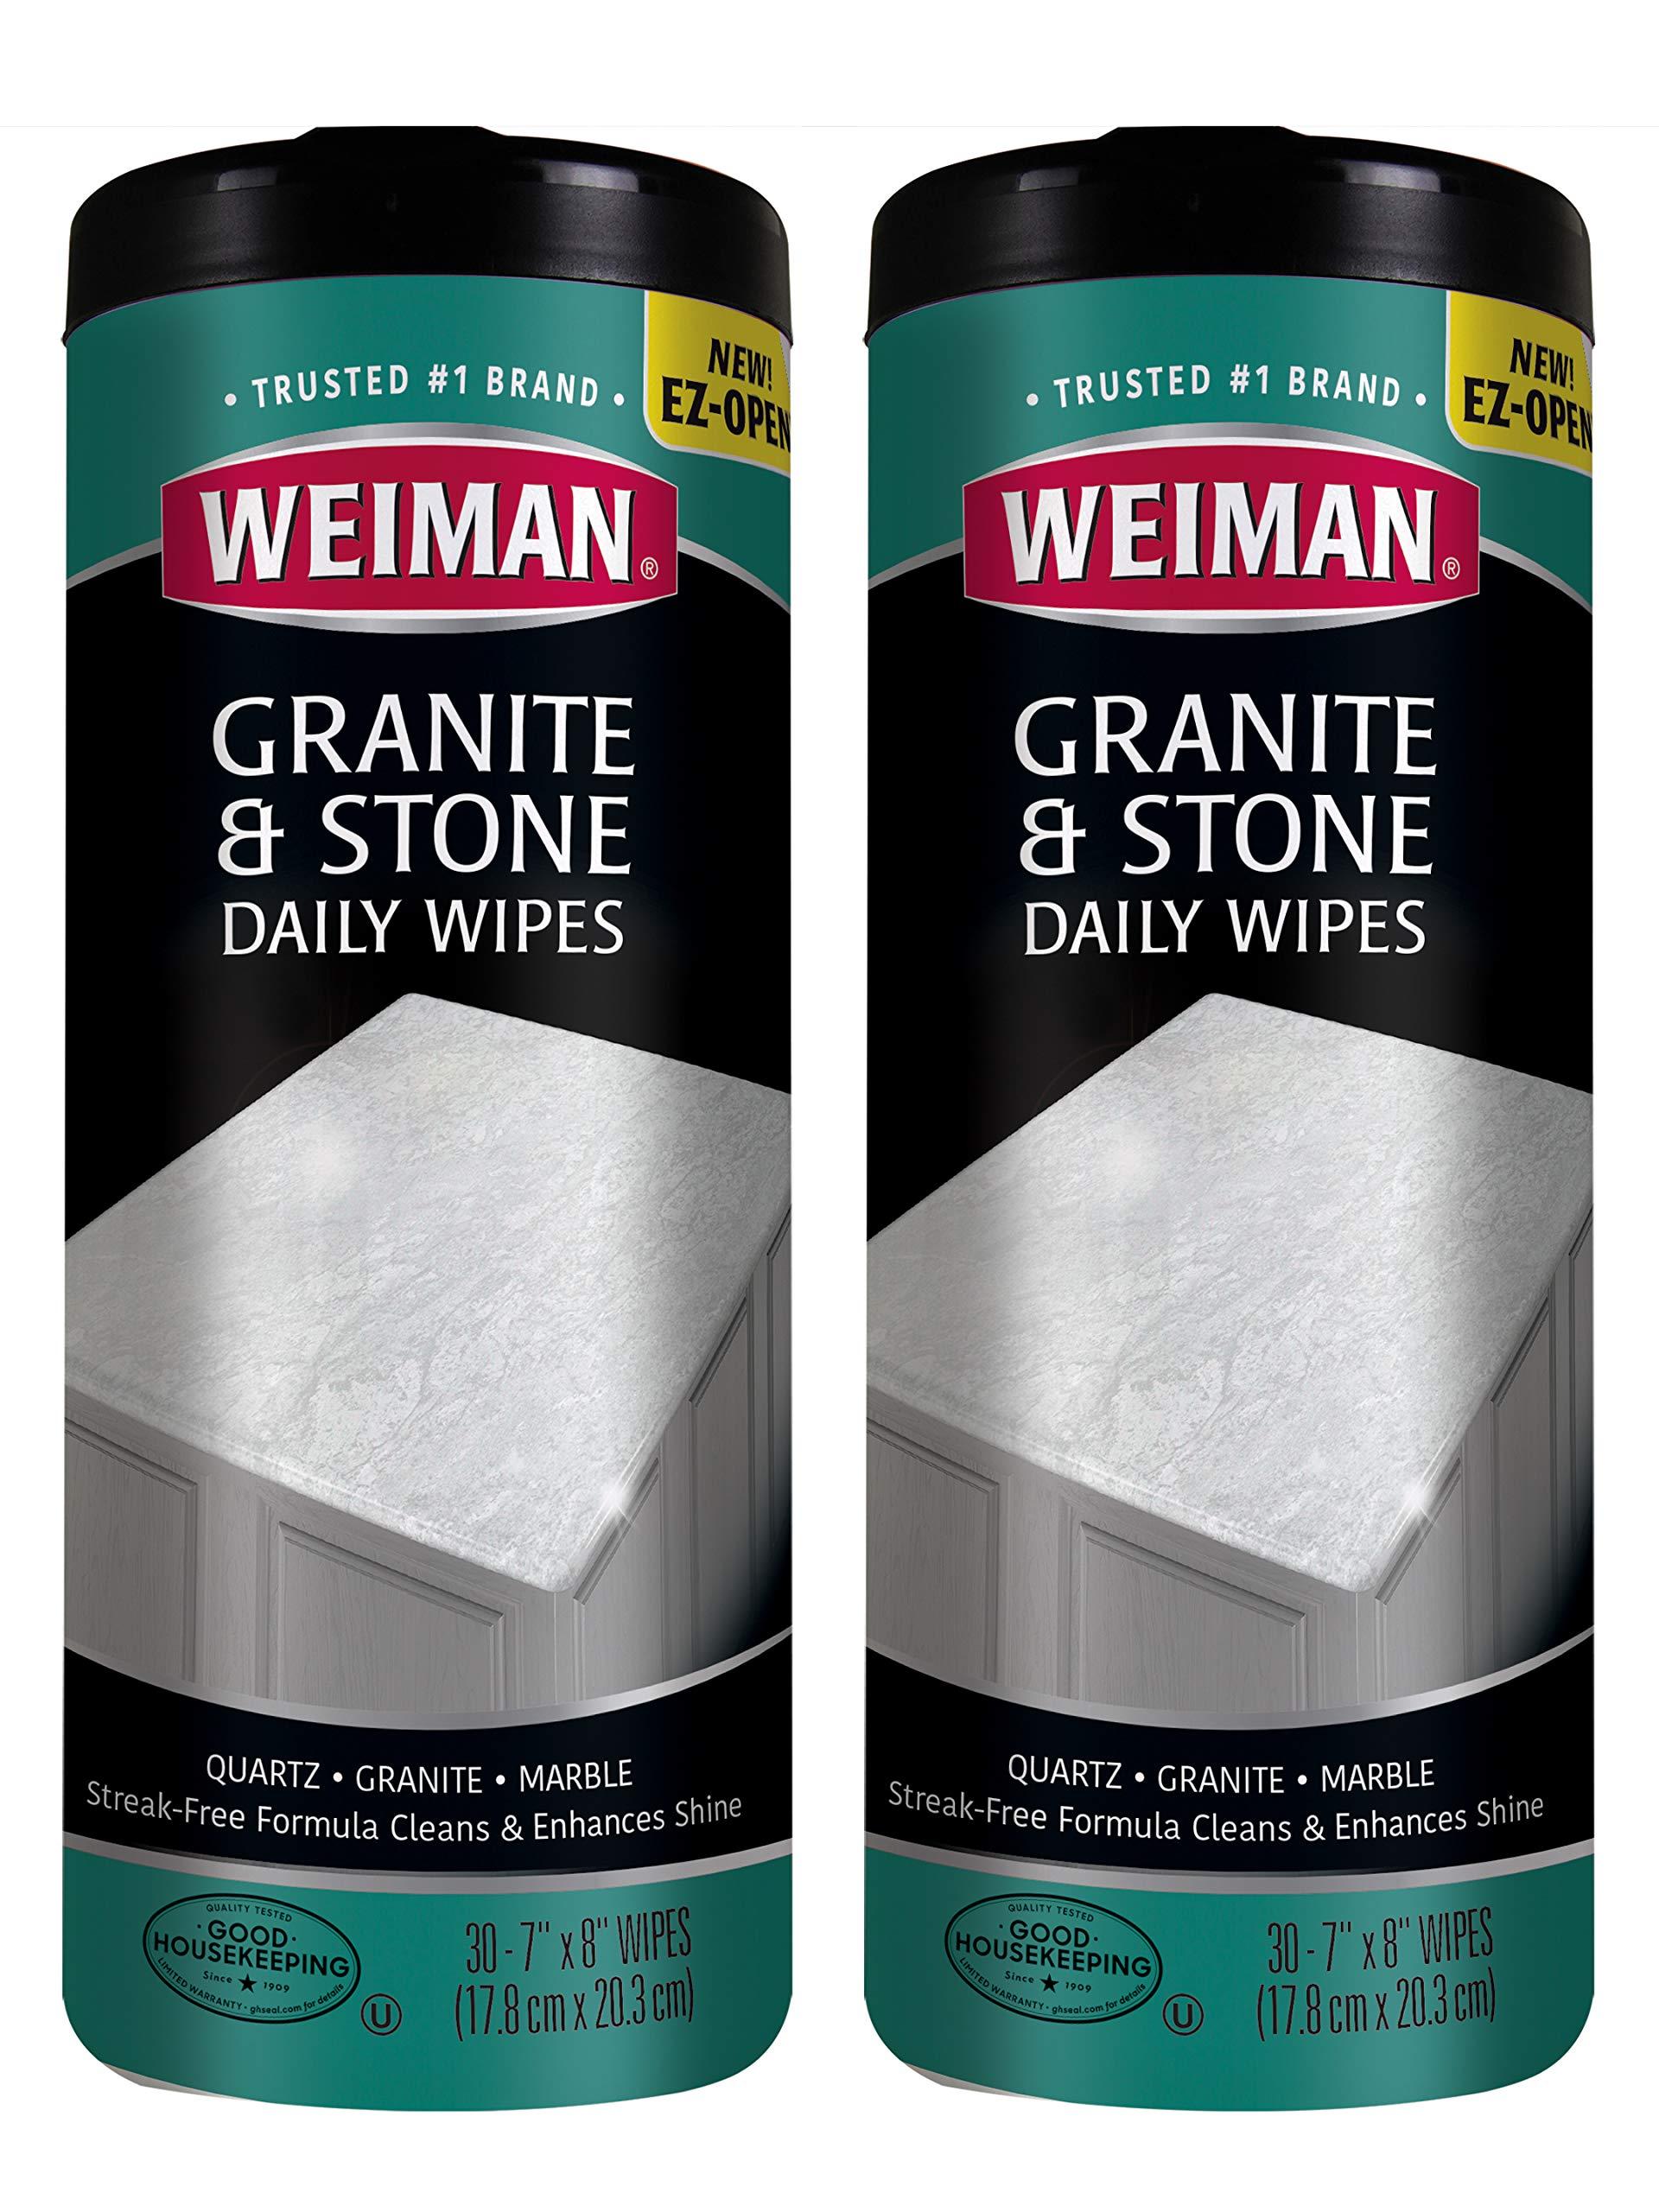 Weiman Granite Wipes Brighten Protects